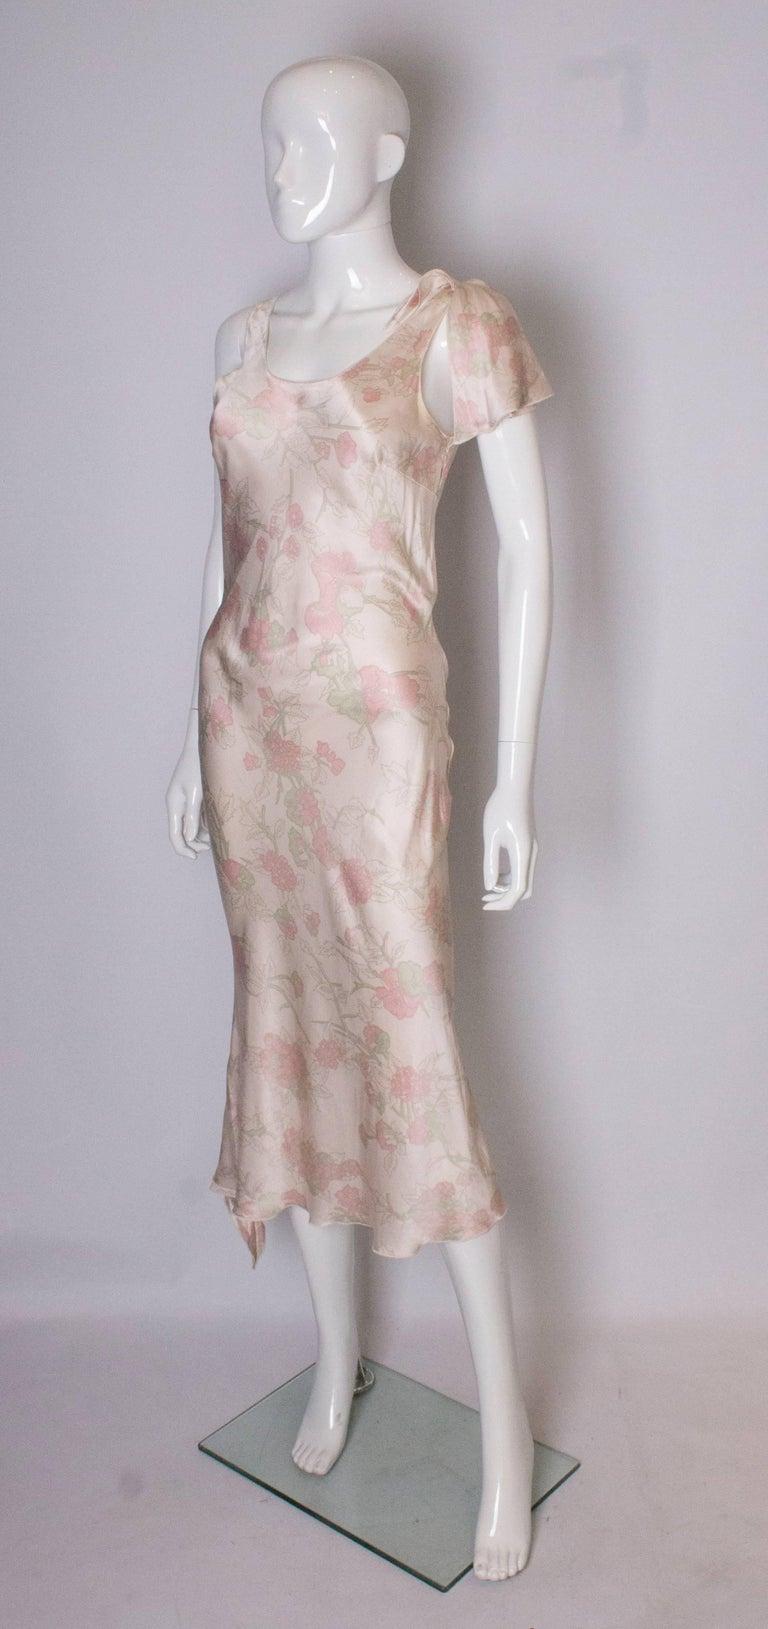 Beige Vintage Ungaro Silk Slip Dress or Nightdress For Sale